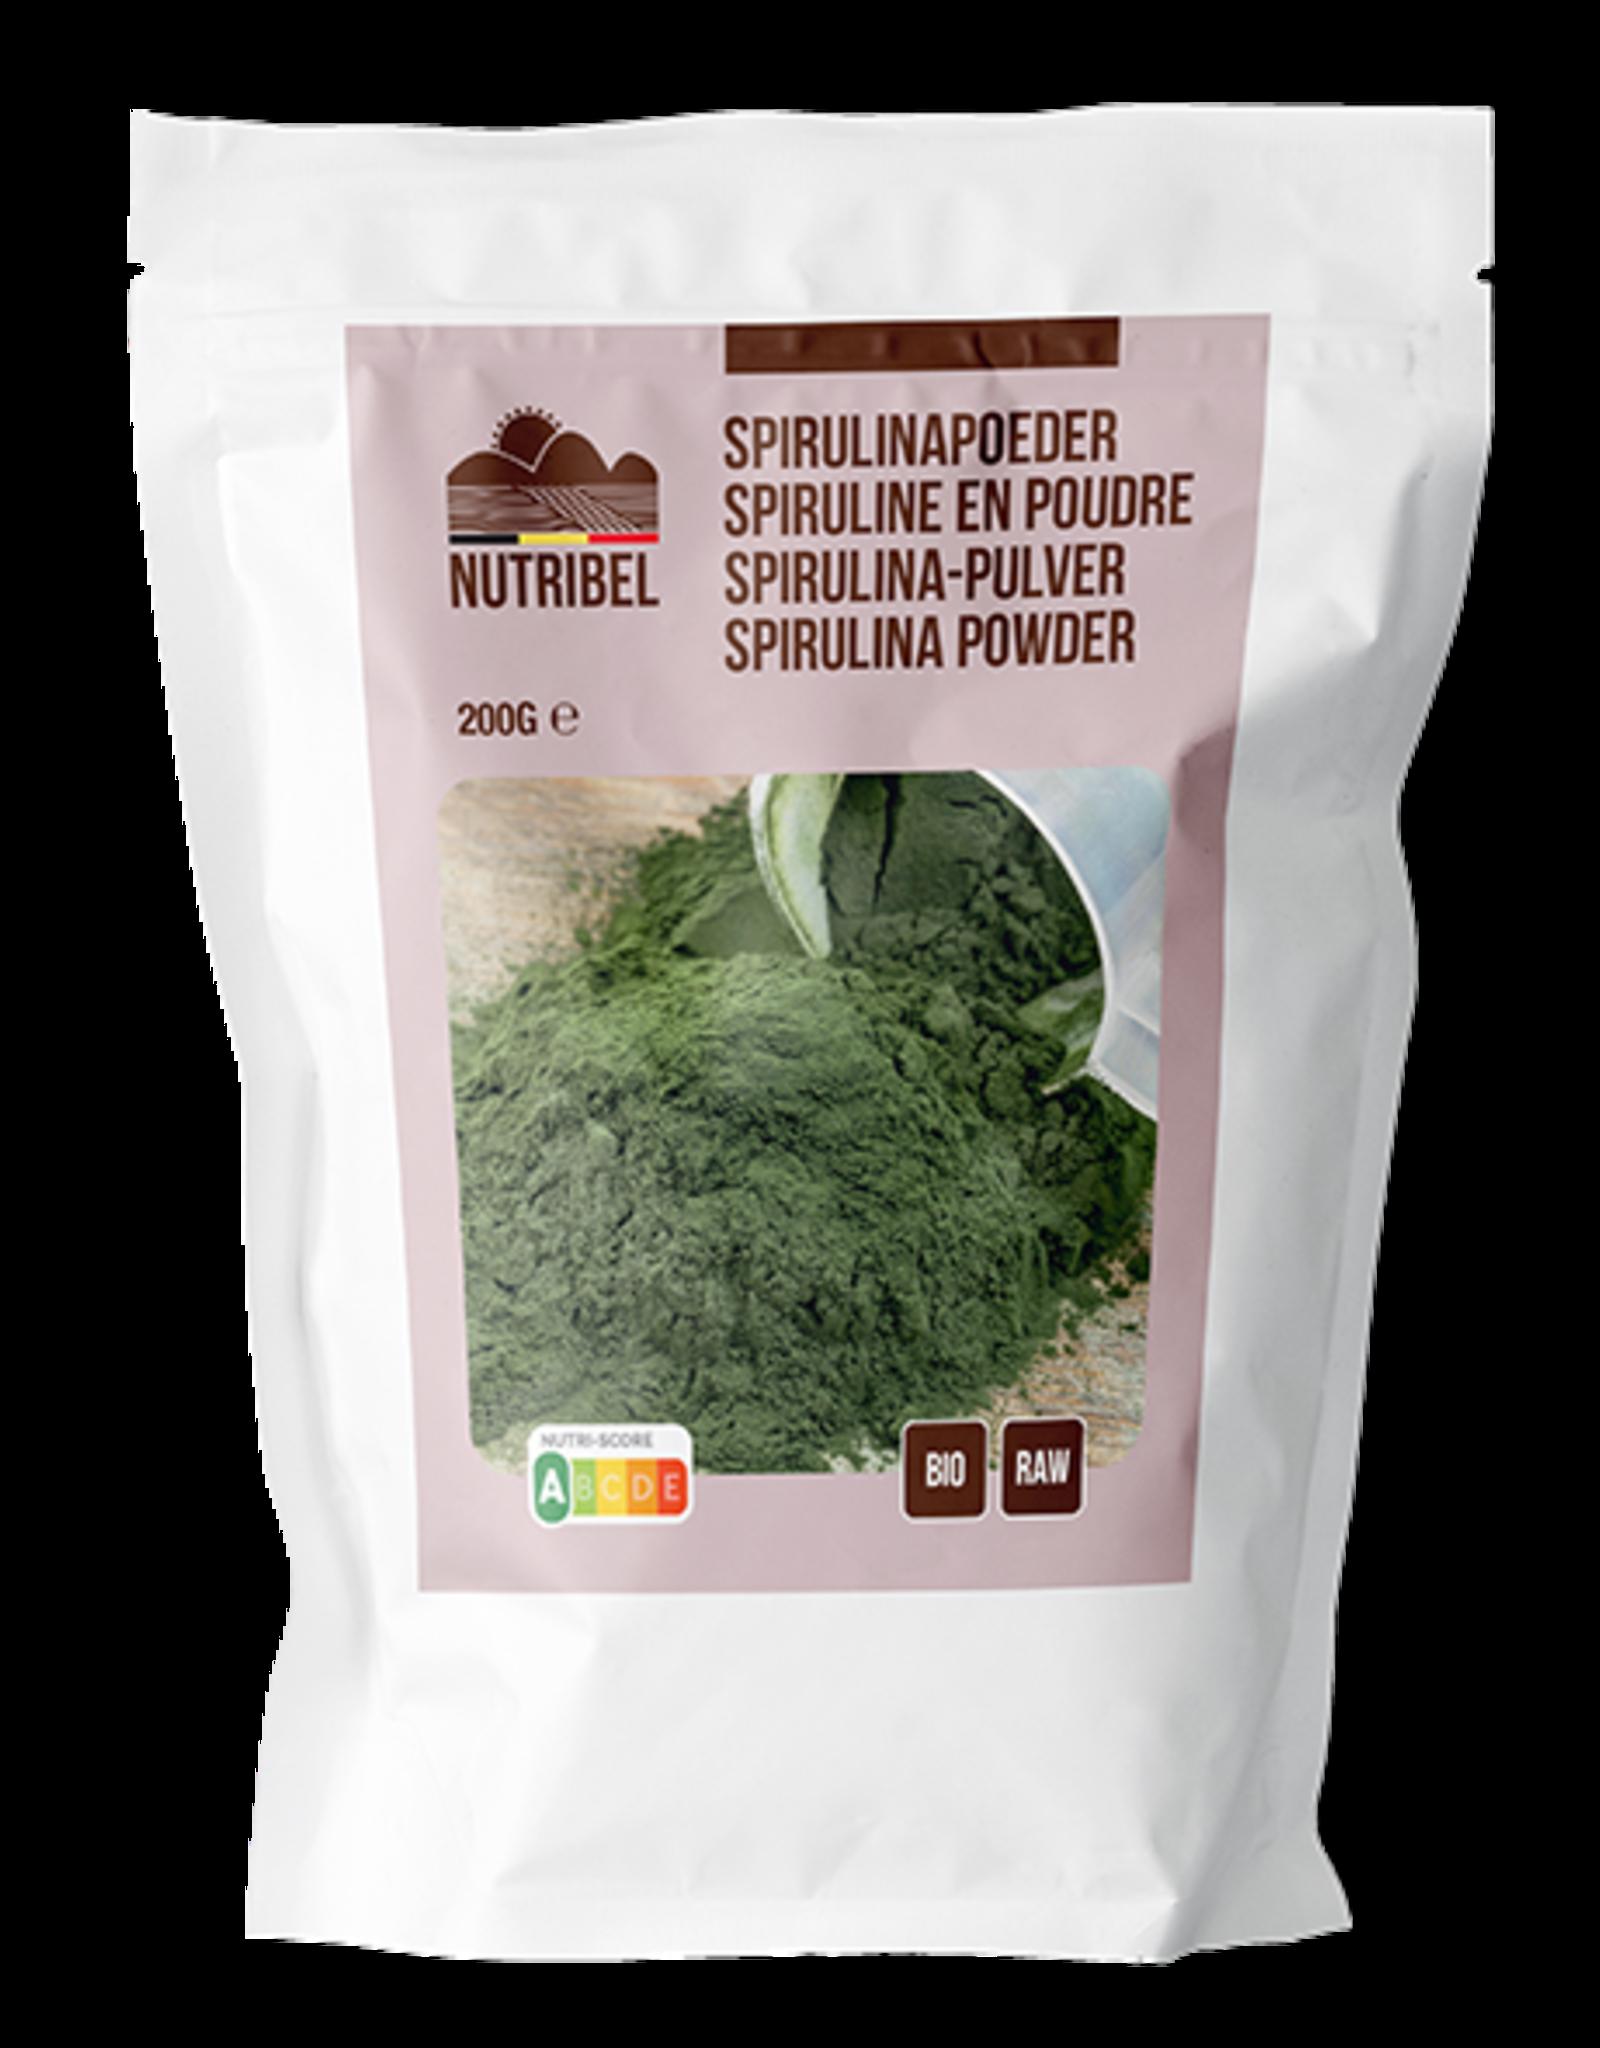 Nutribel Spiruline poudre bio & raw 200g